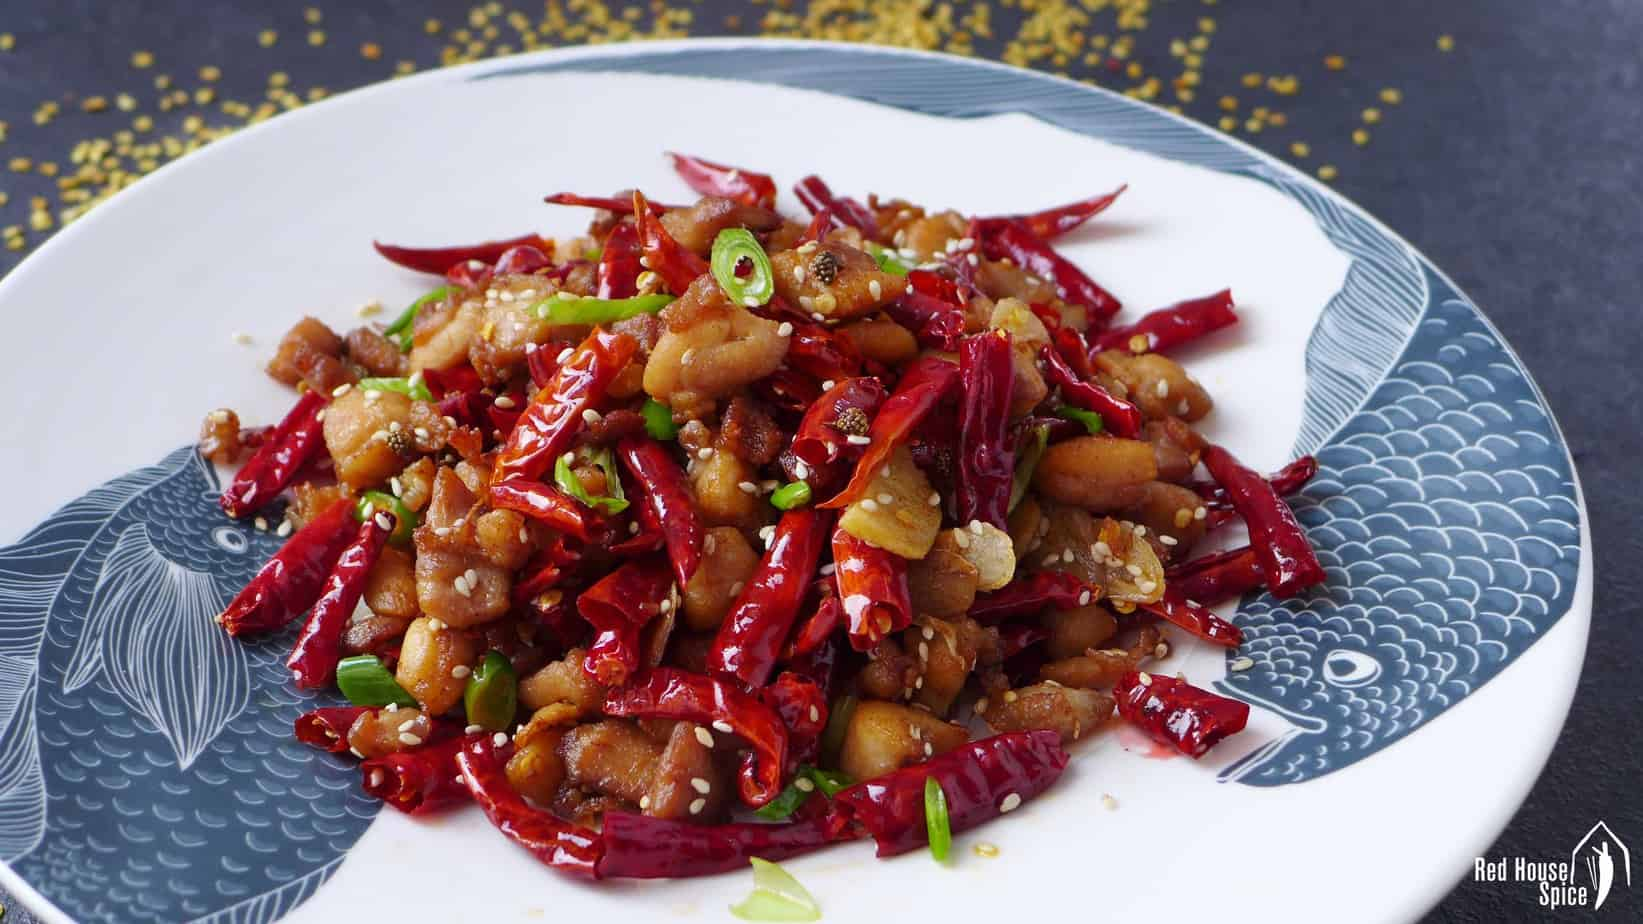 Mala Chicken Chongqing Laziji 辣子鸡 Red House Spice